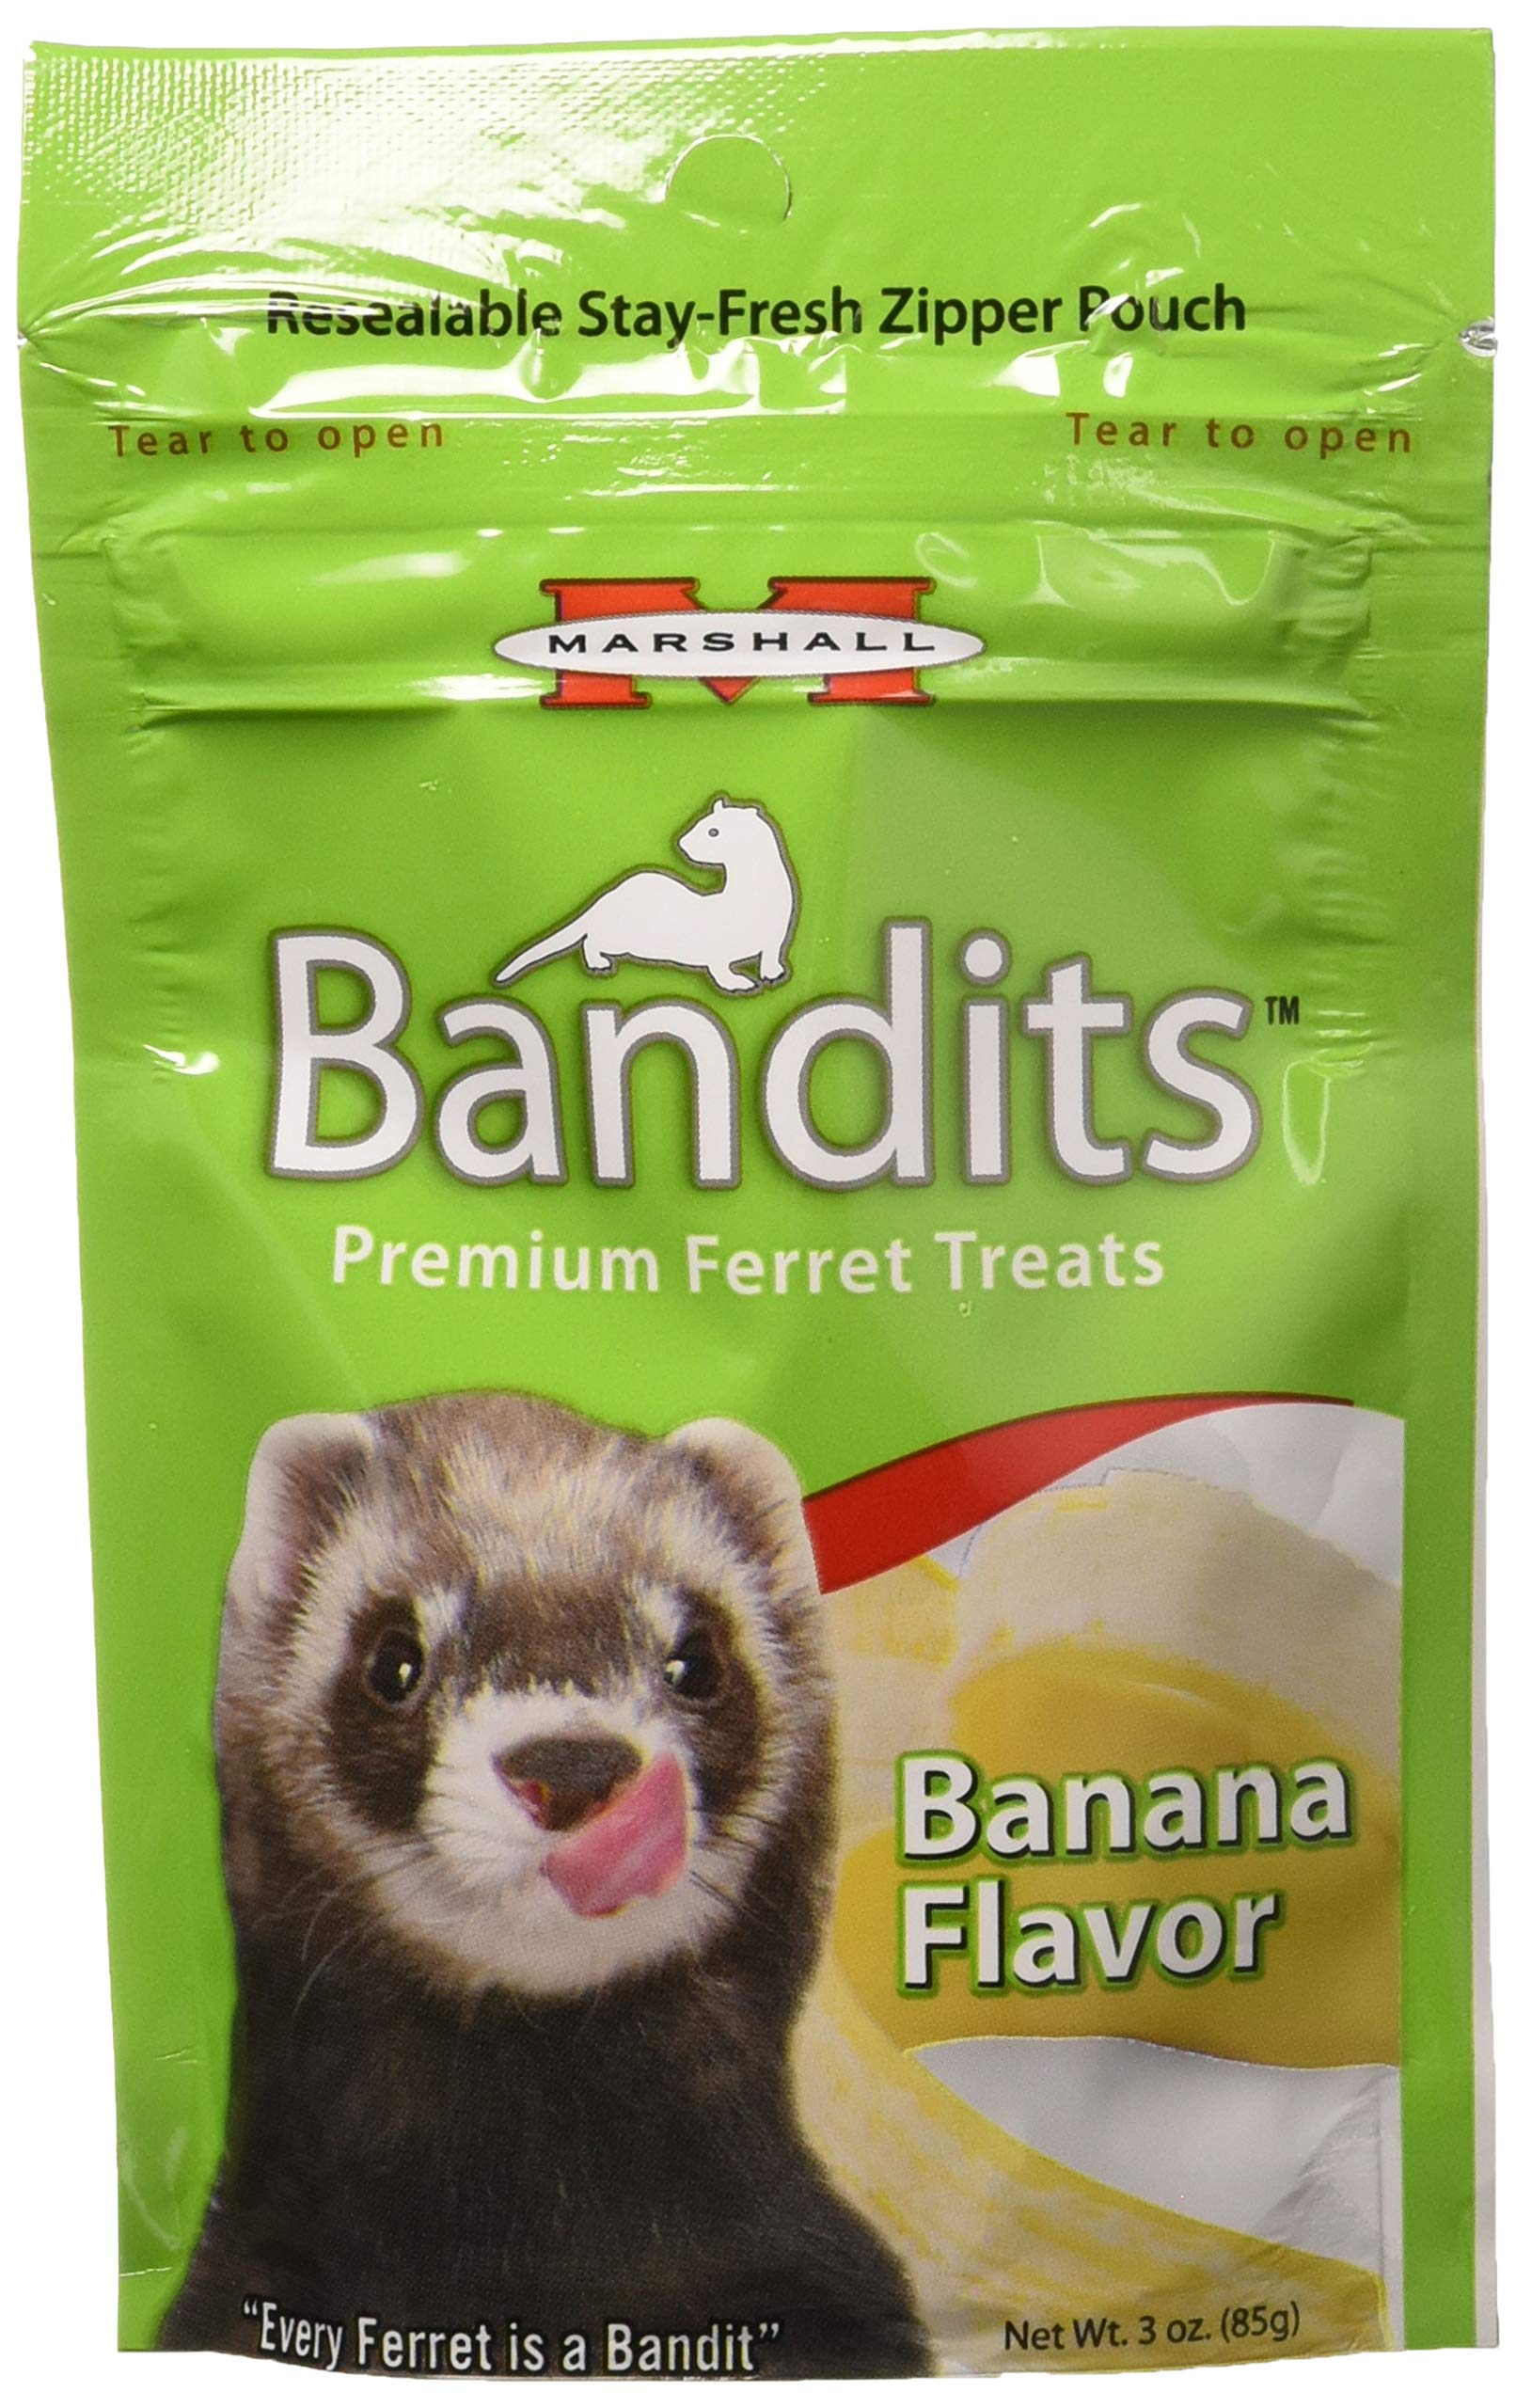 Marshall Bandits Ferret Treat Banana 1.875lbs (10 x 3oz)